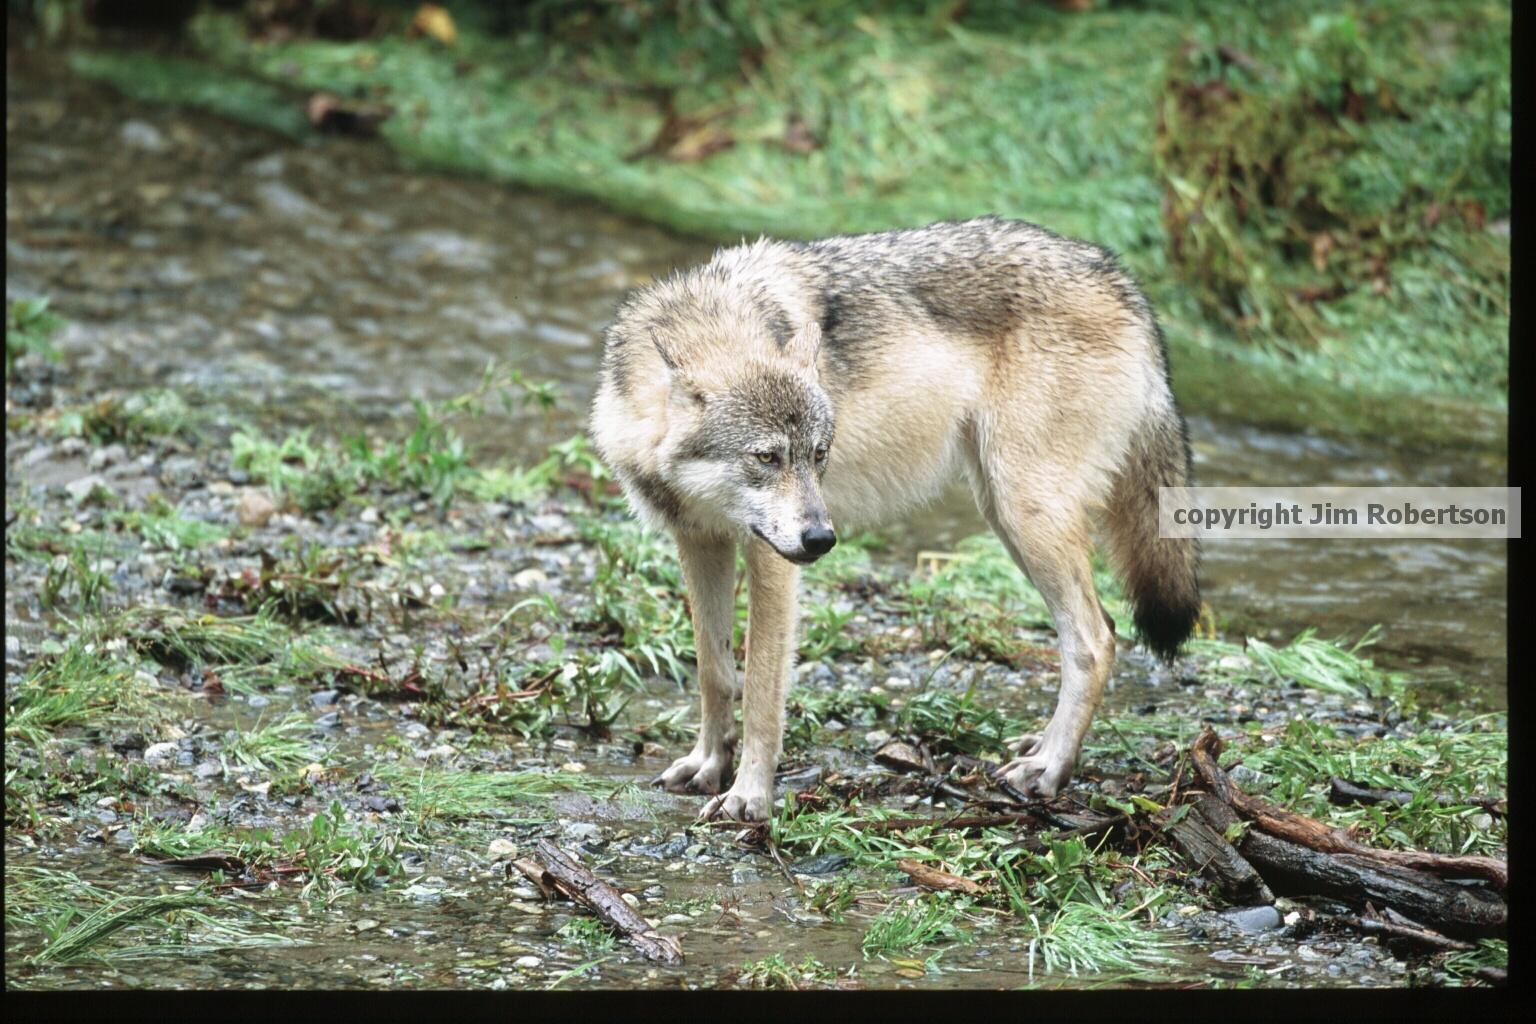 Arizona House OK's bill targeting wolf recovery program